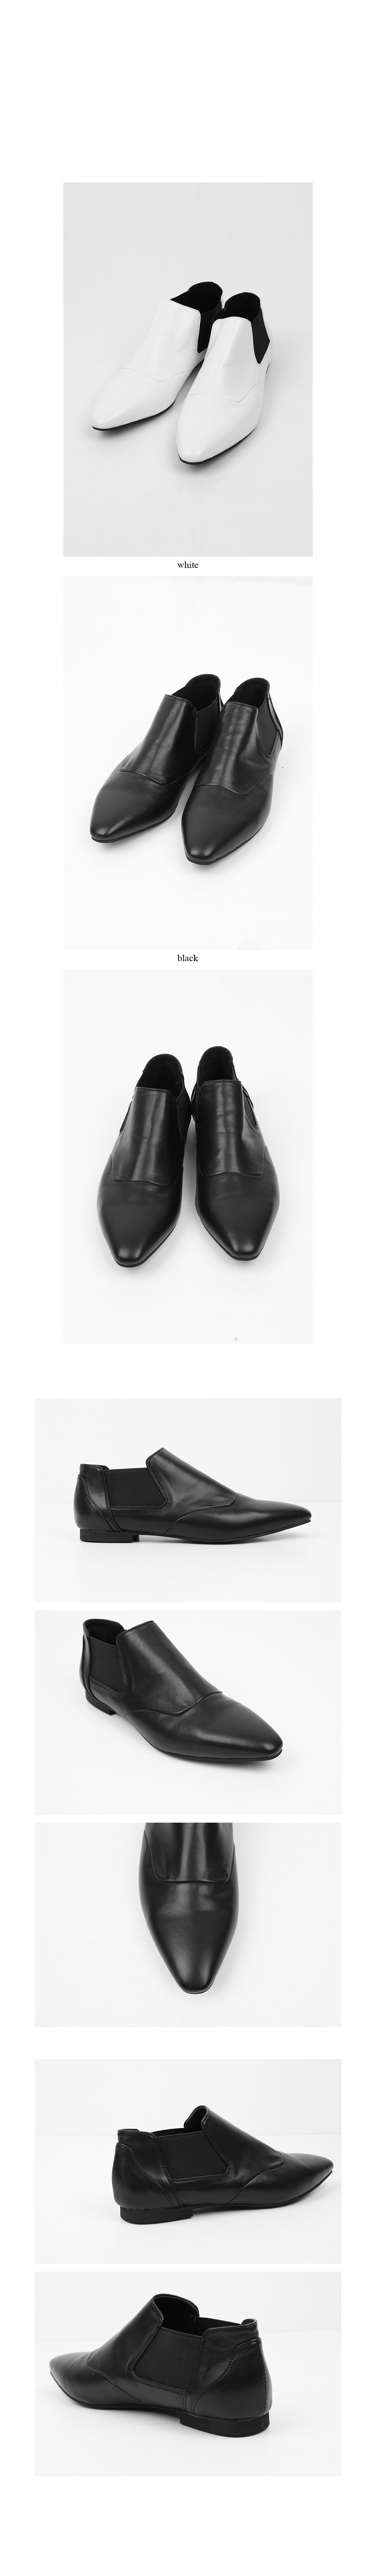 missy mood leather loafer